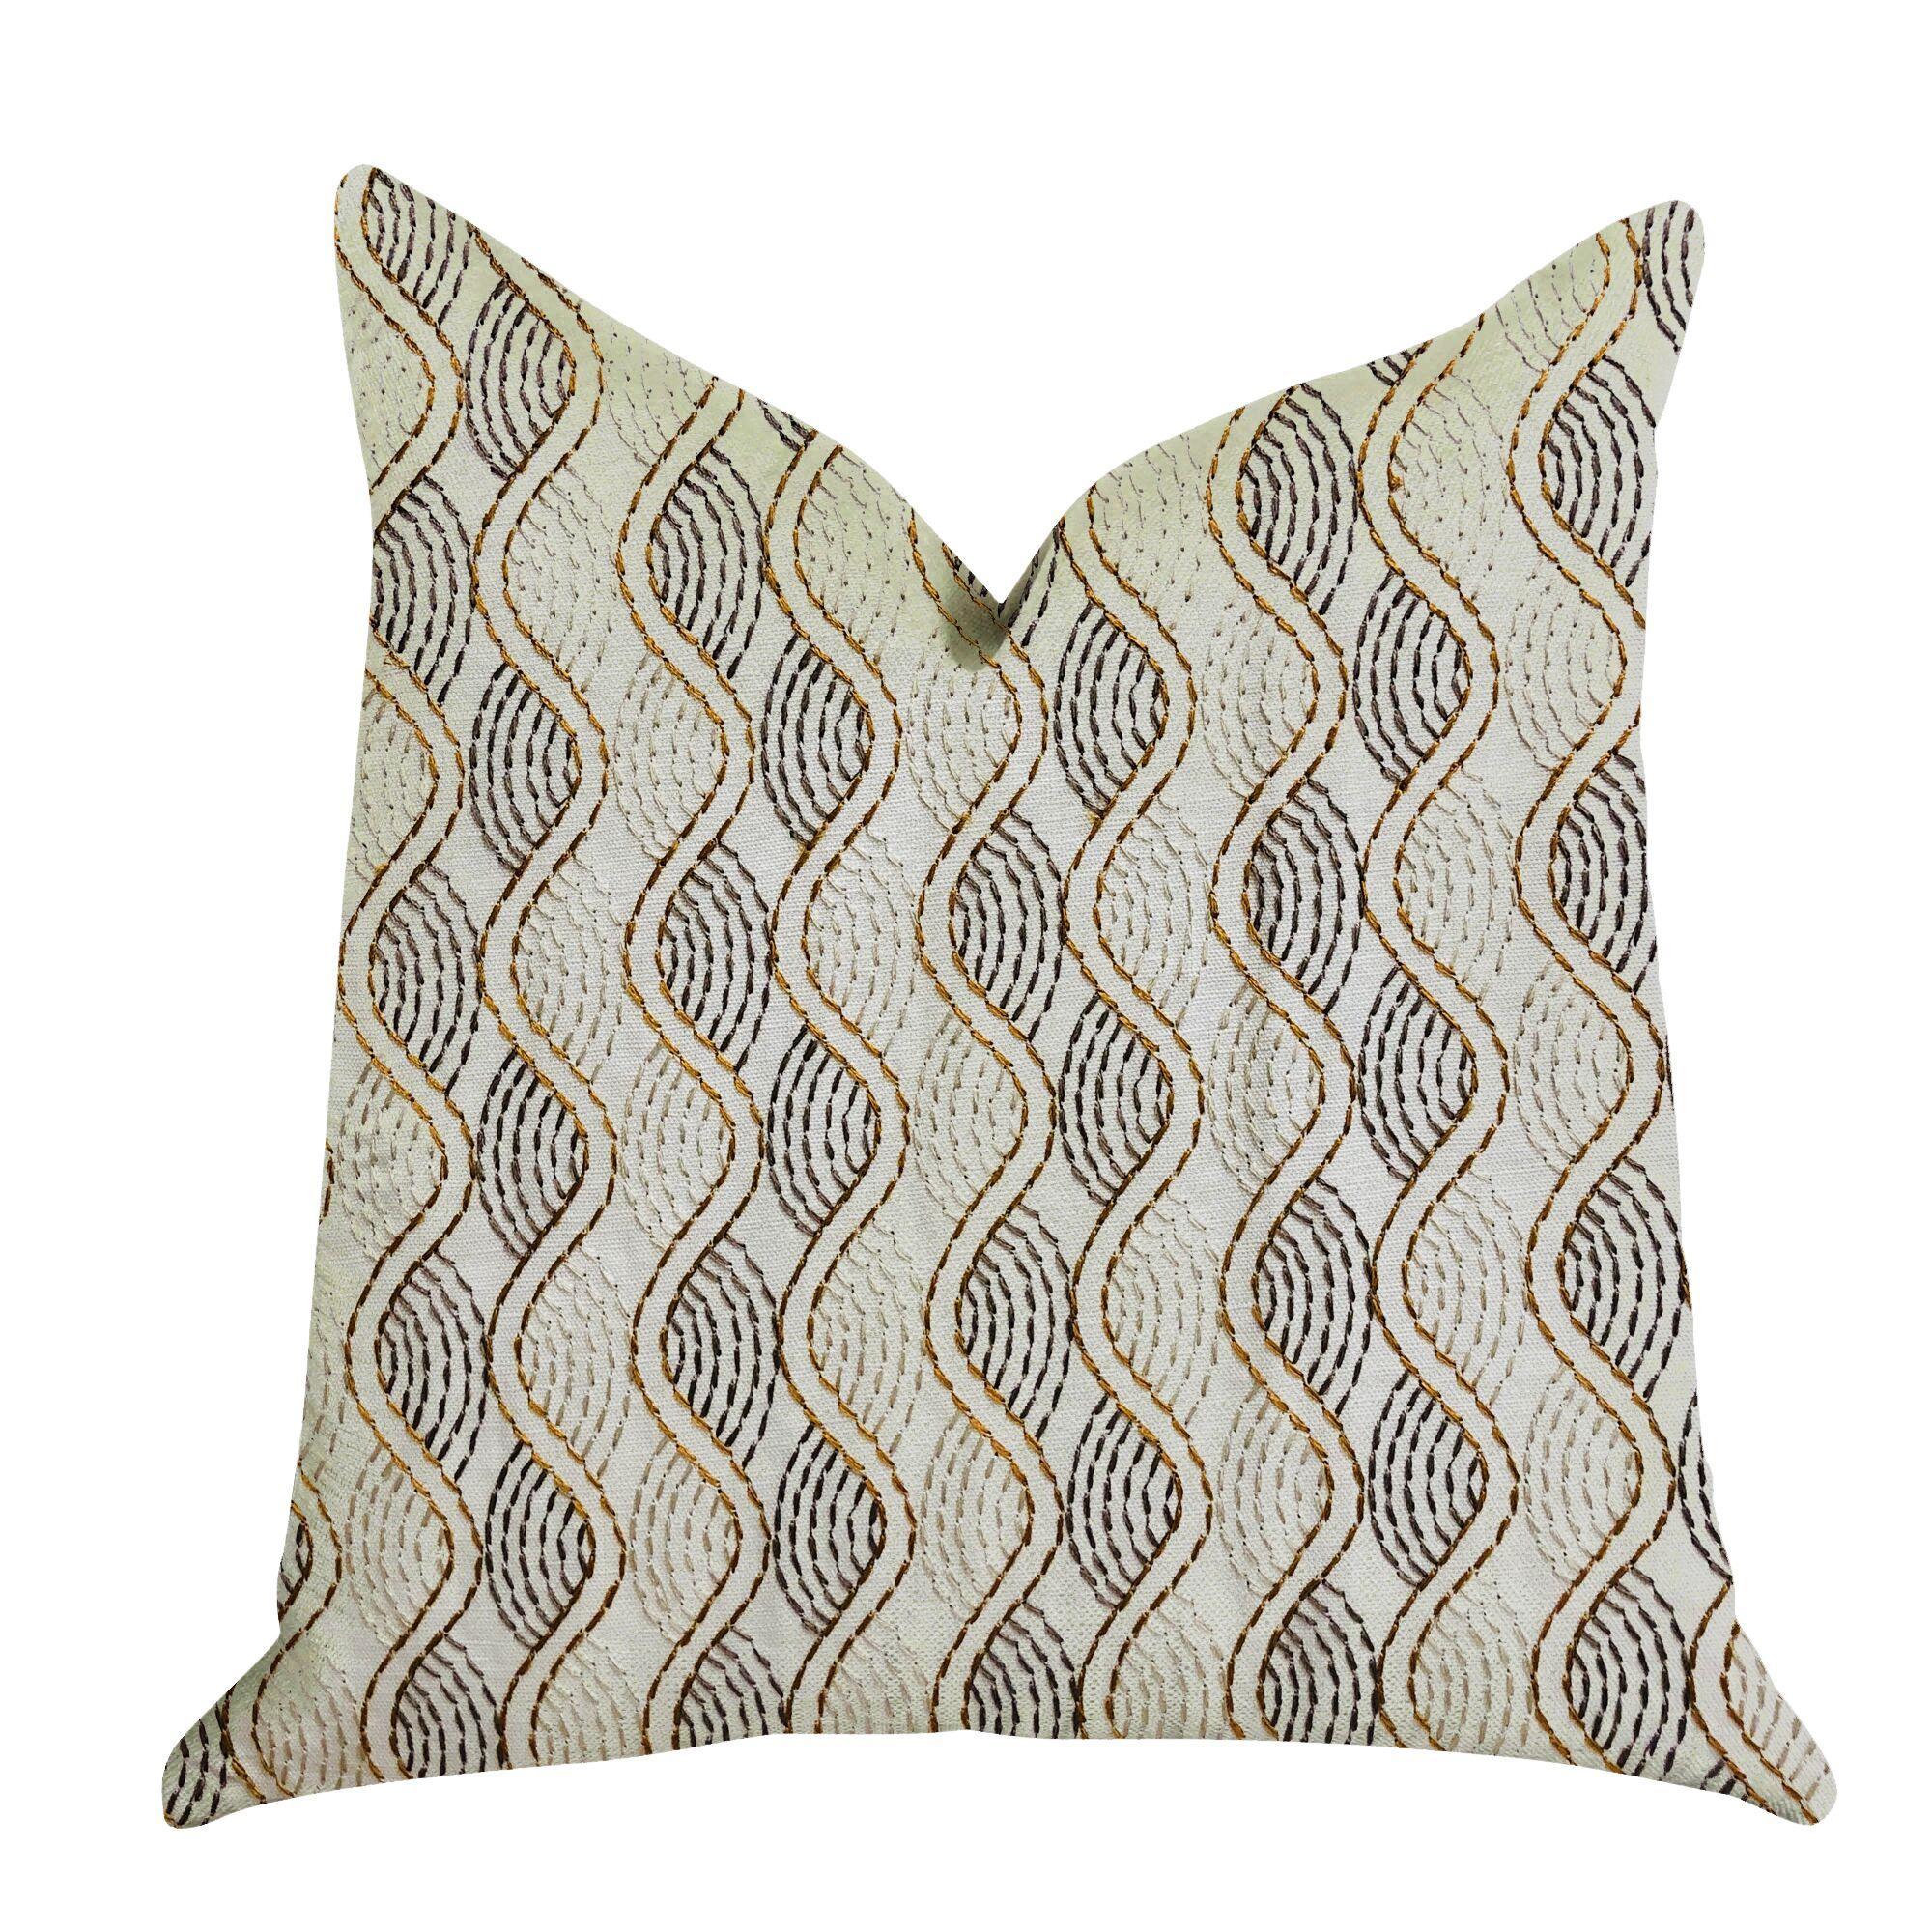 Mccrory Luxury Pillow Size: 20